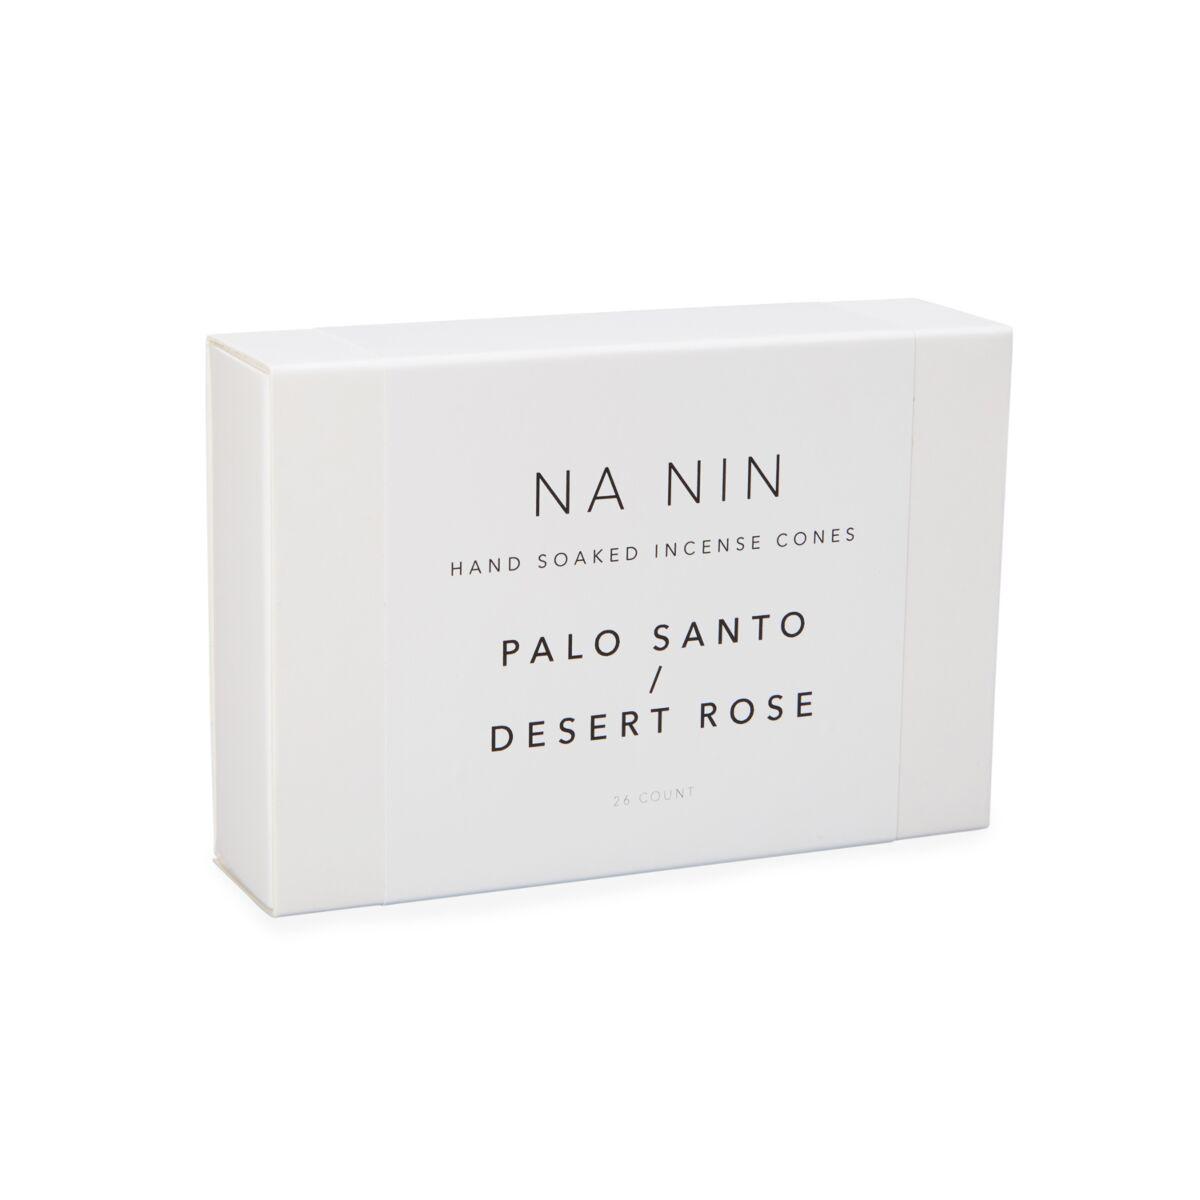 Palo Santo & Desert Rose Incense Cones image